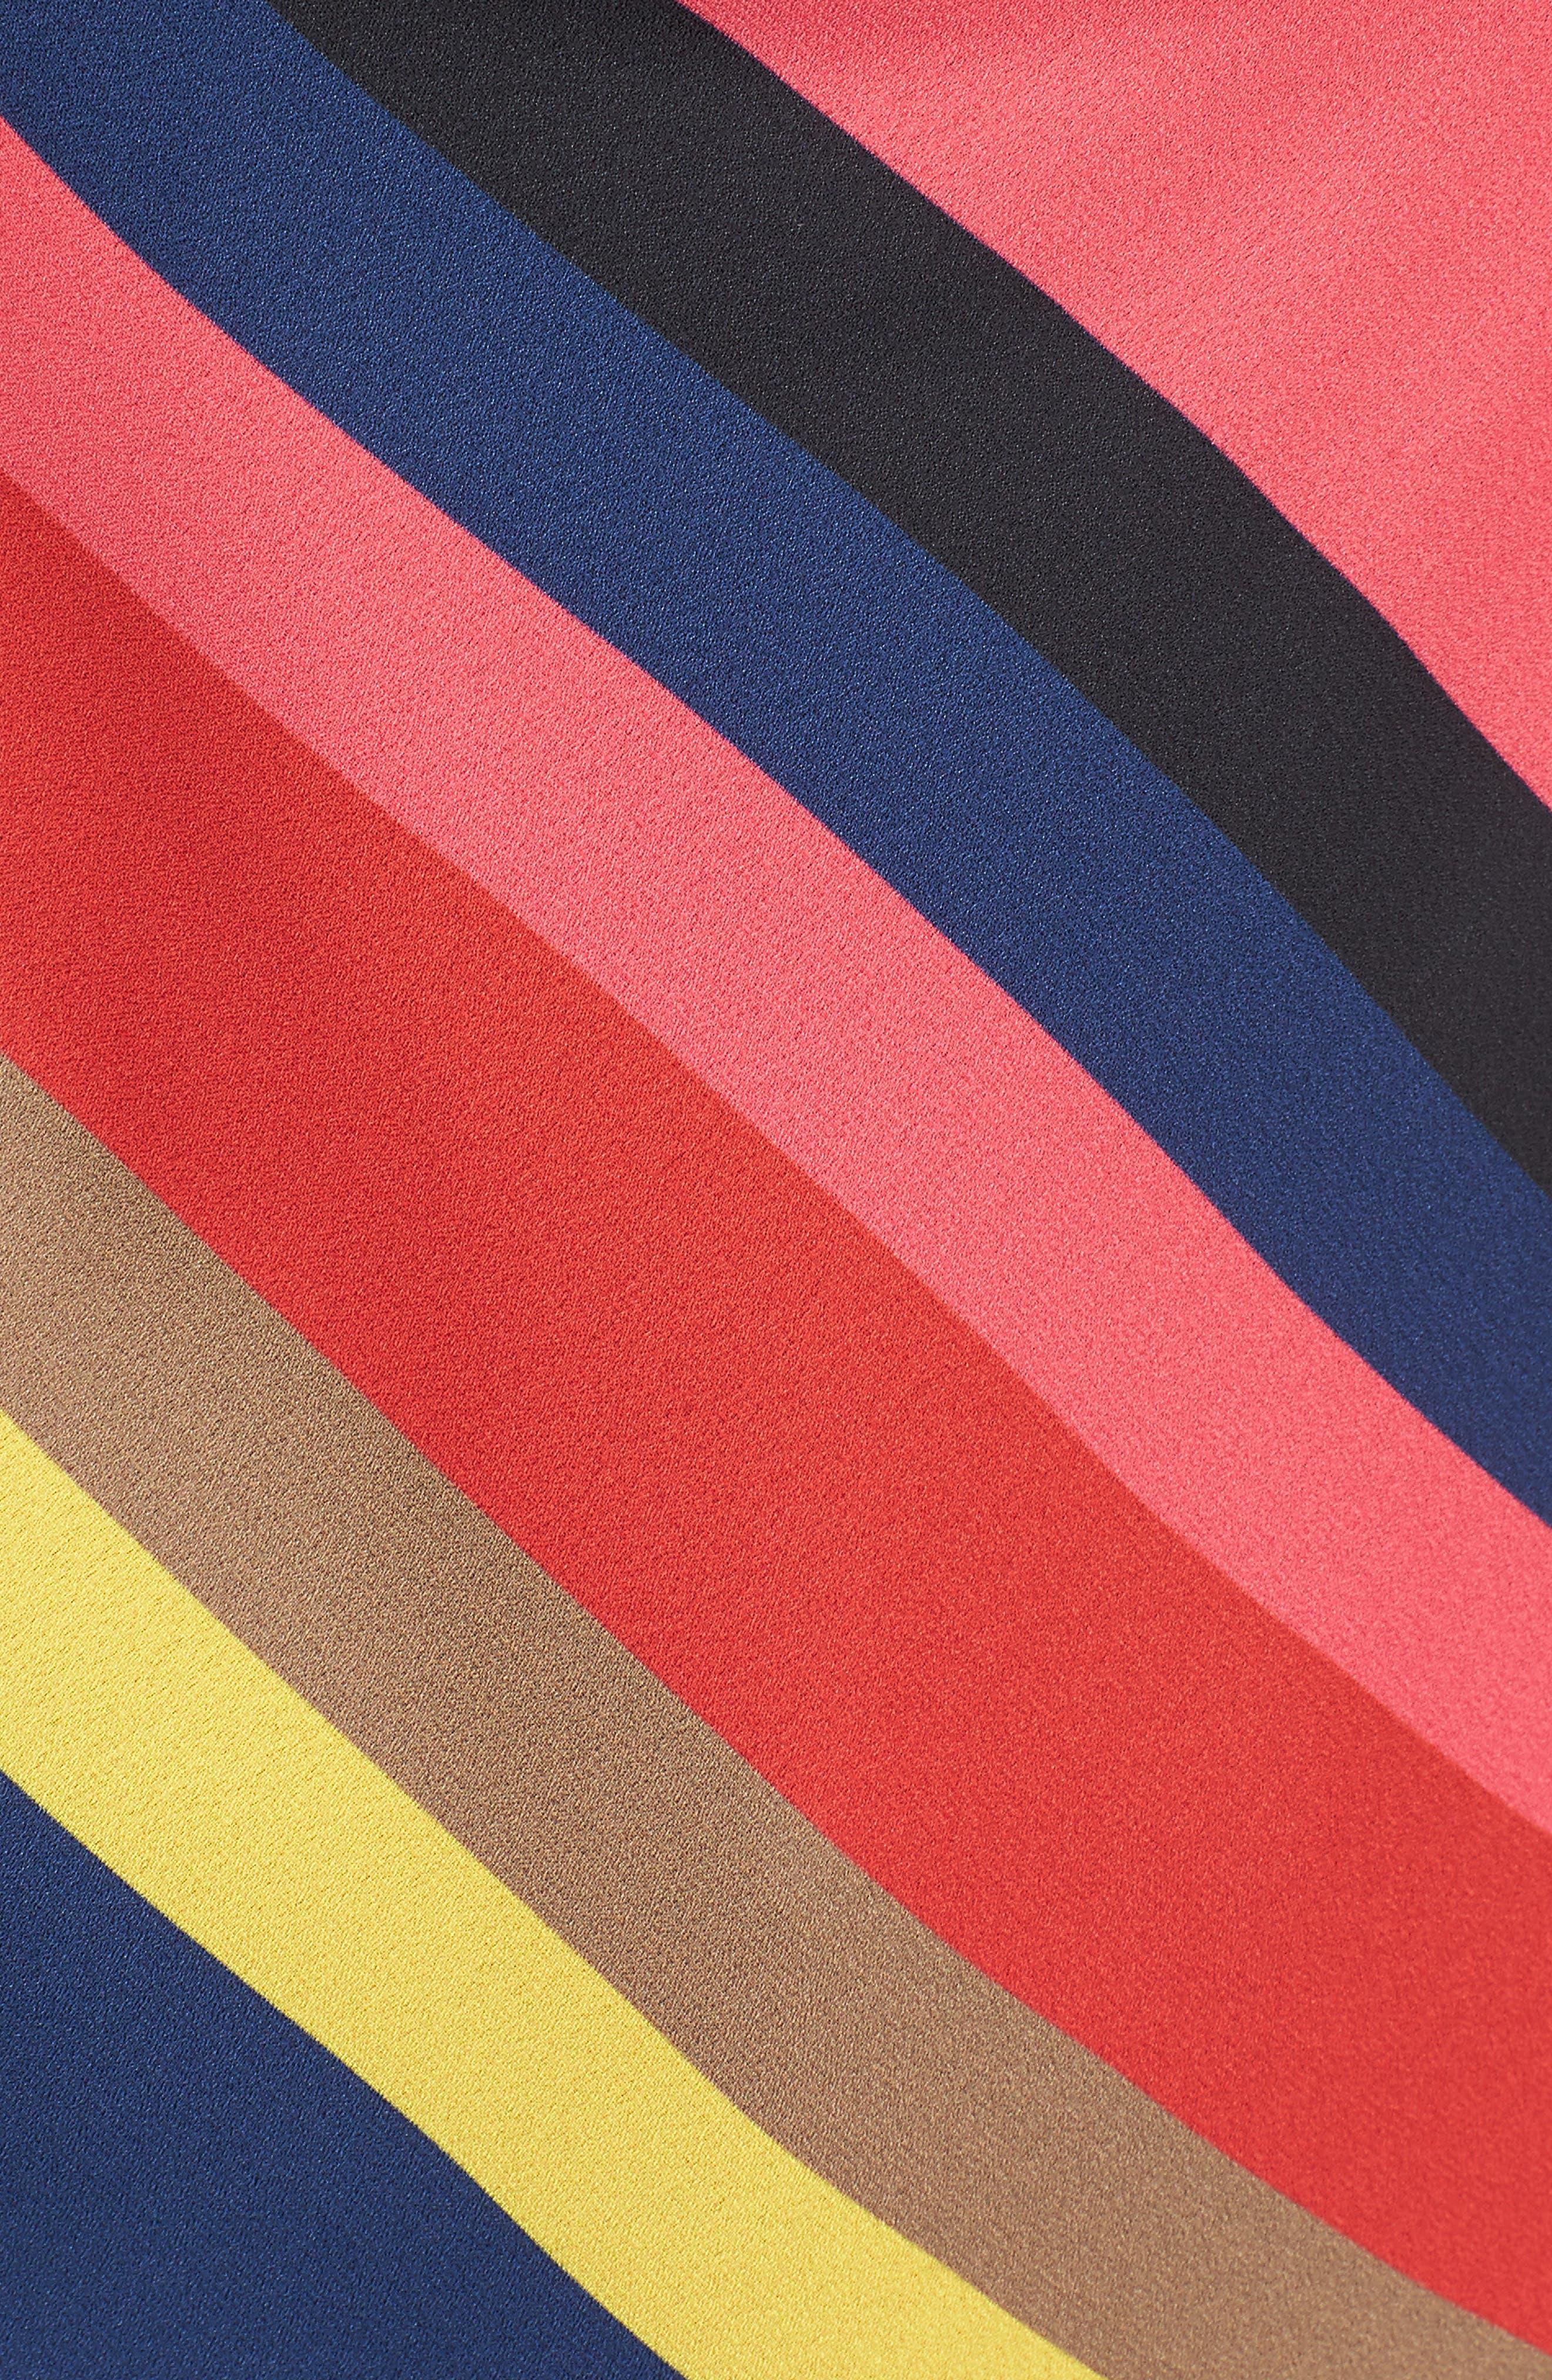 Stripe Cowl Neck Tank,                             Alternate thumbnail 5, color,                             BLACK/ RED/ FUCHSIA